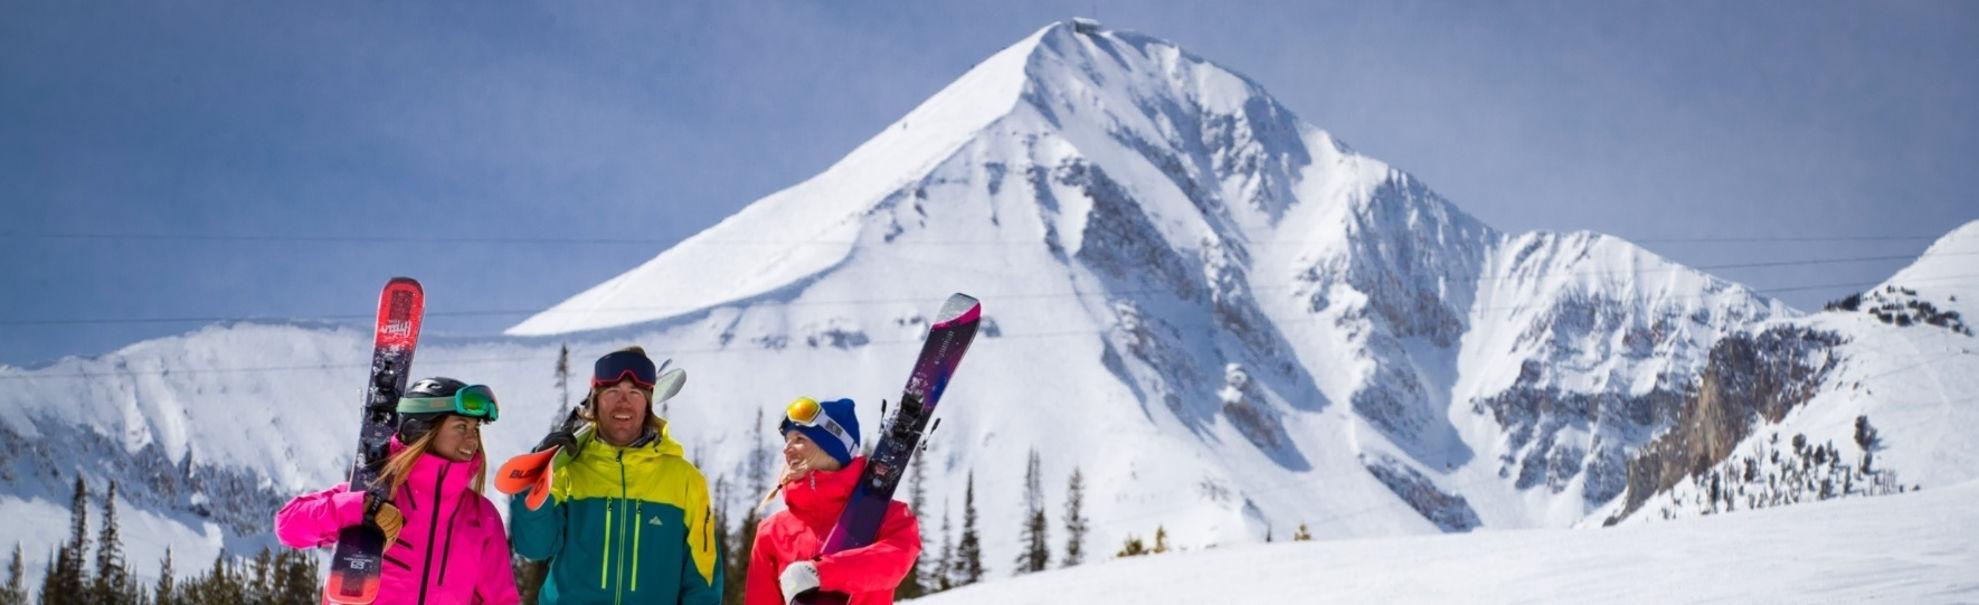 Picture of ULLR Ski Club